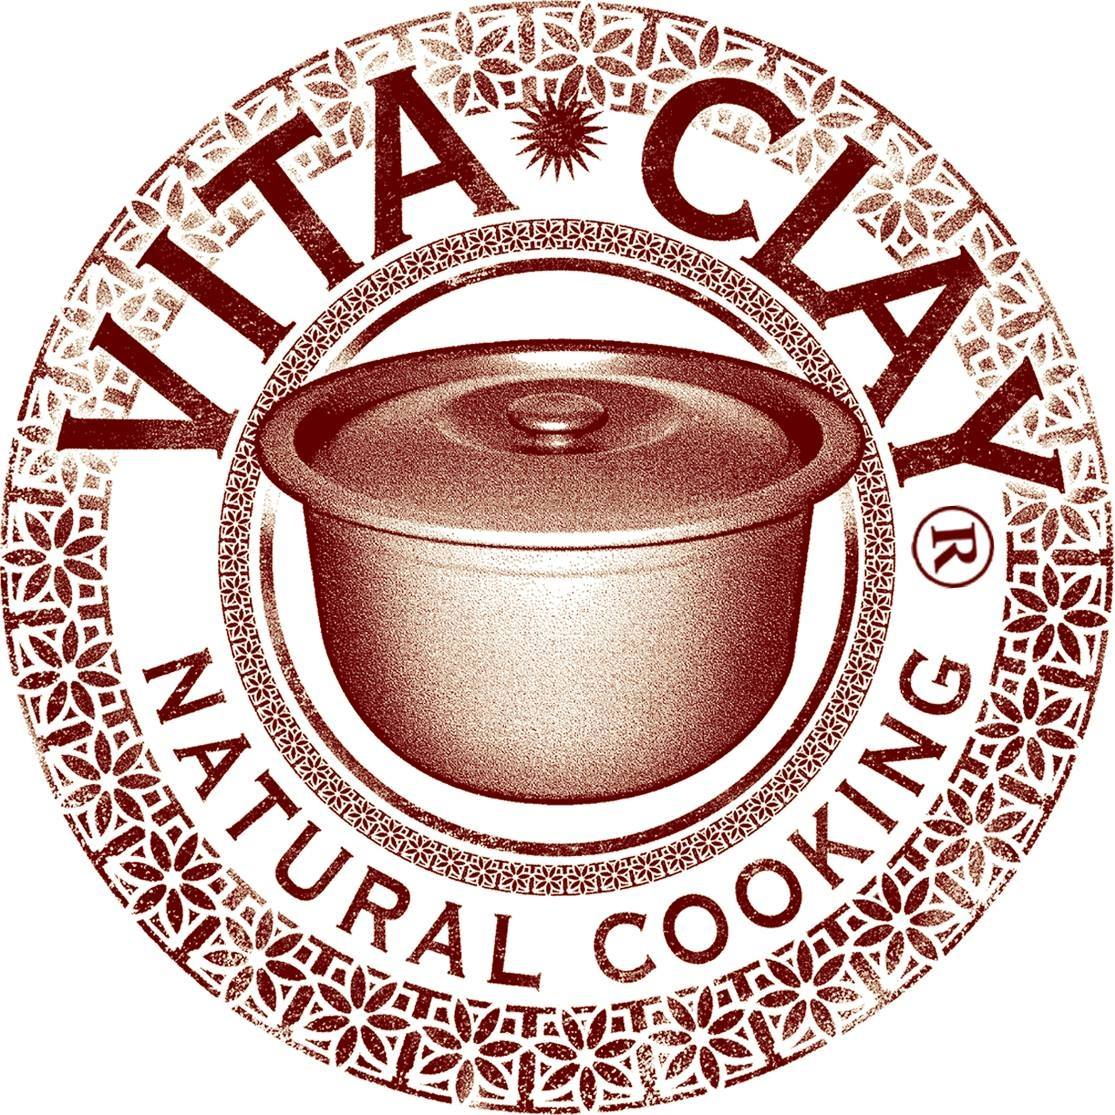 Vita Clay, Natural Cooking, Clay slow cooker, food, cooking, nontoxic